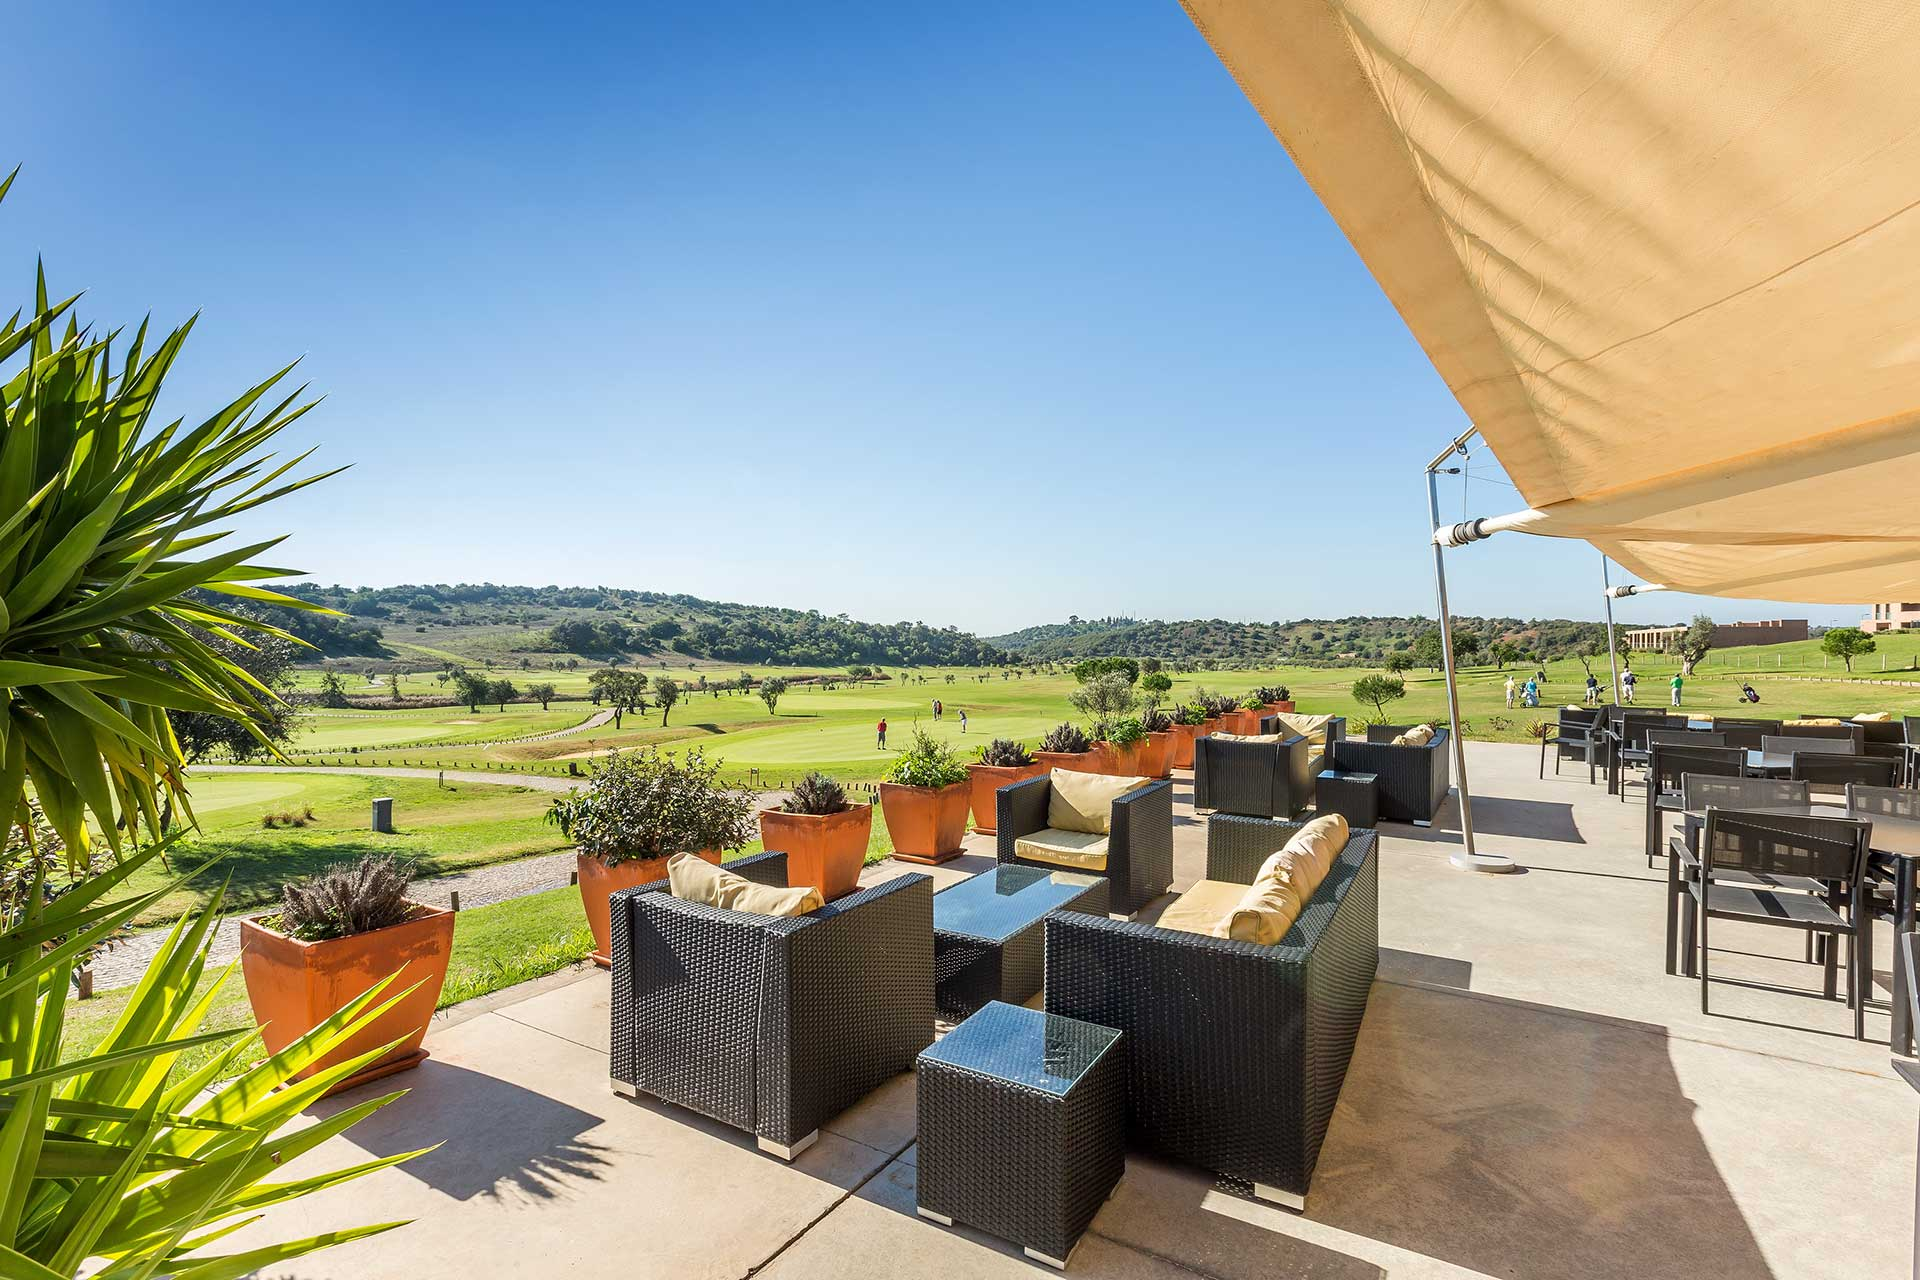 Golf-expedition-golfreizen-golfresort-Morgado-Golf-&-Country-Club-Morgado-Golf-Resort-Bar-Lobby